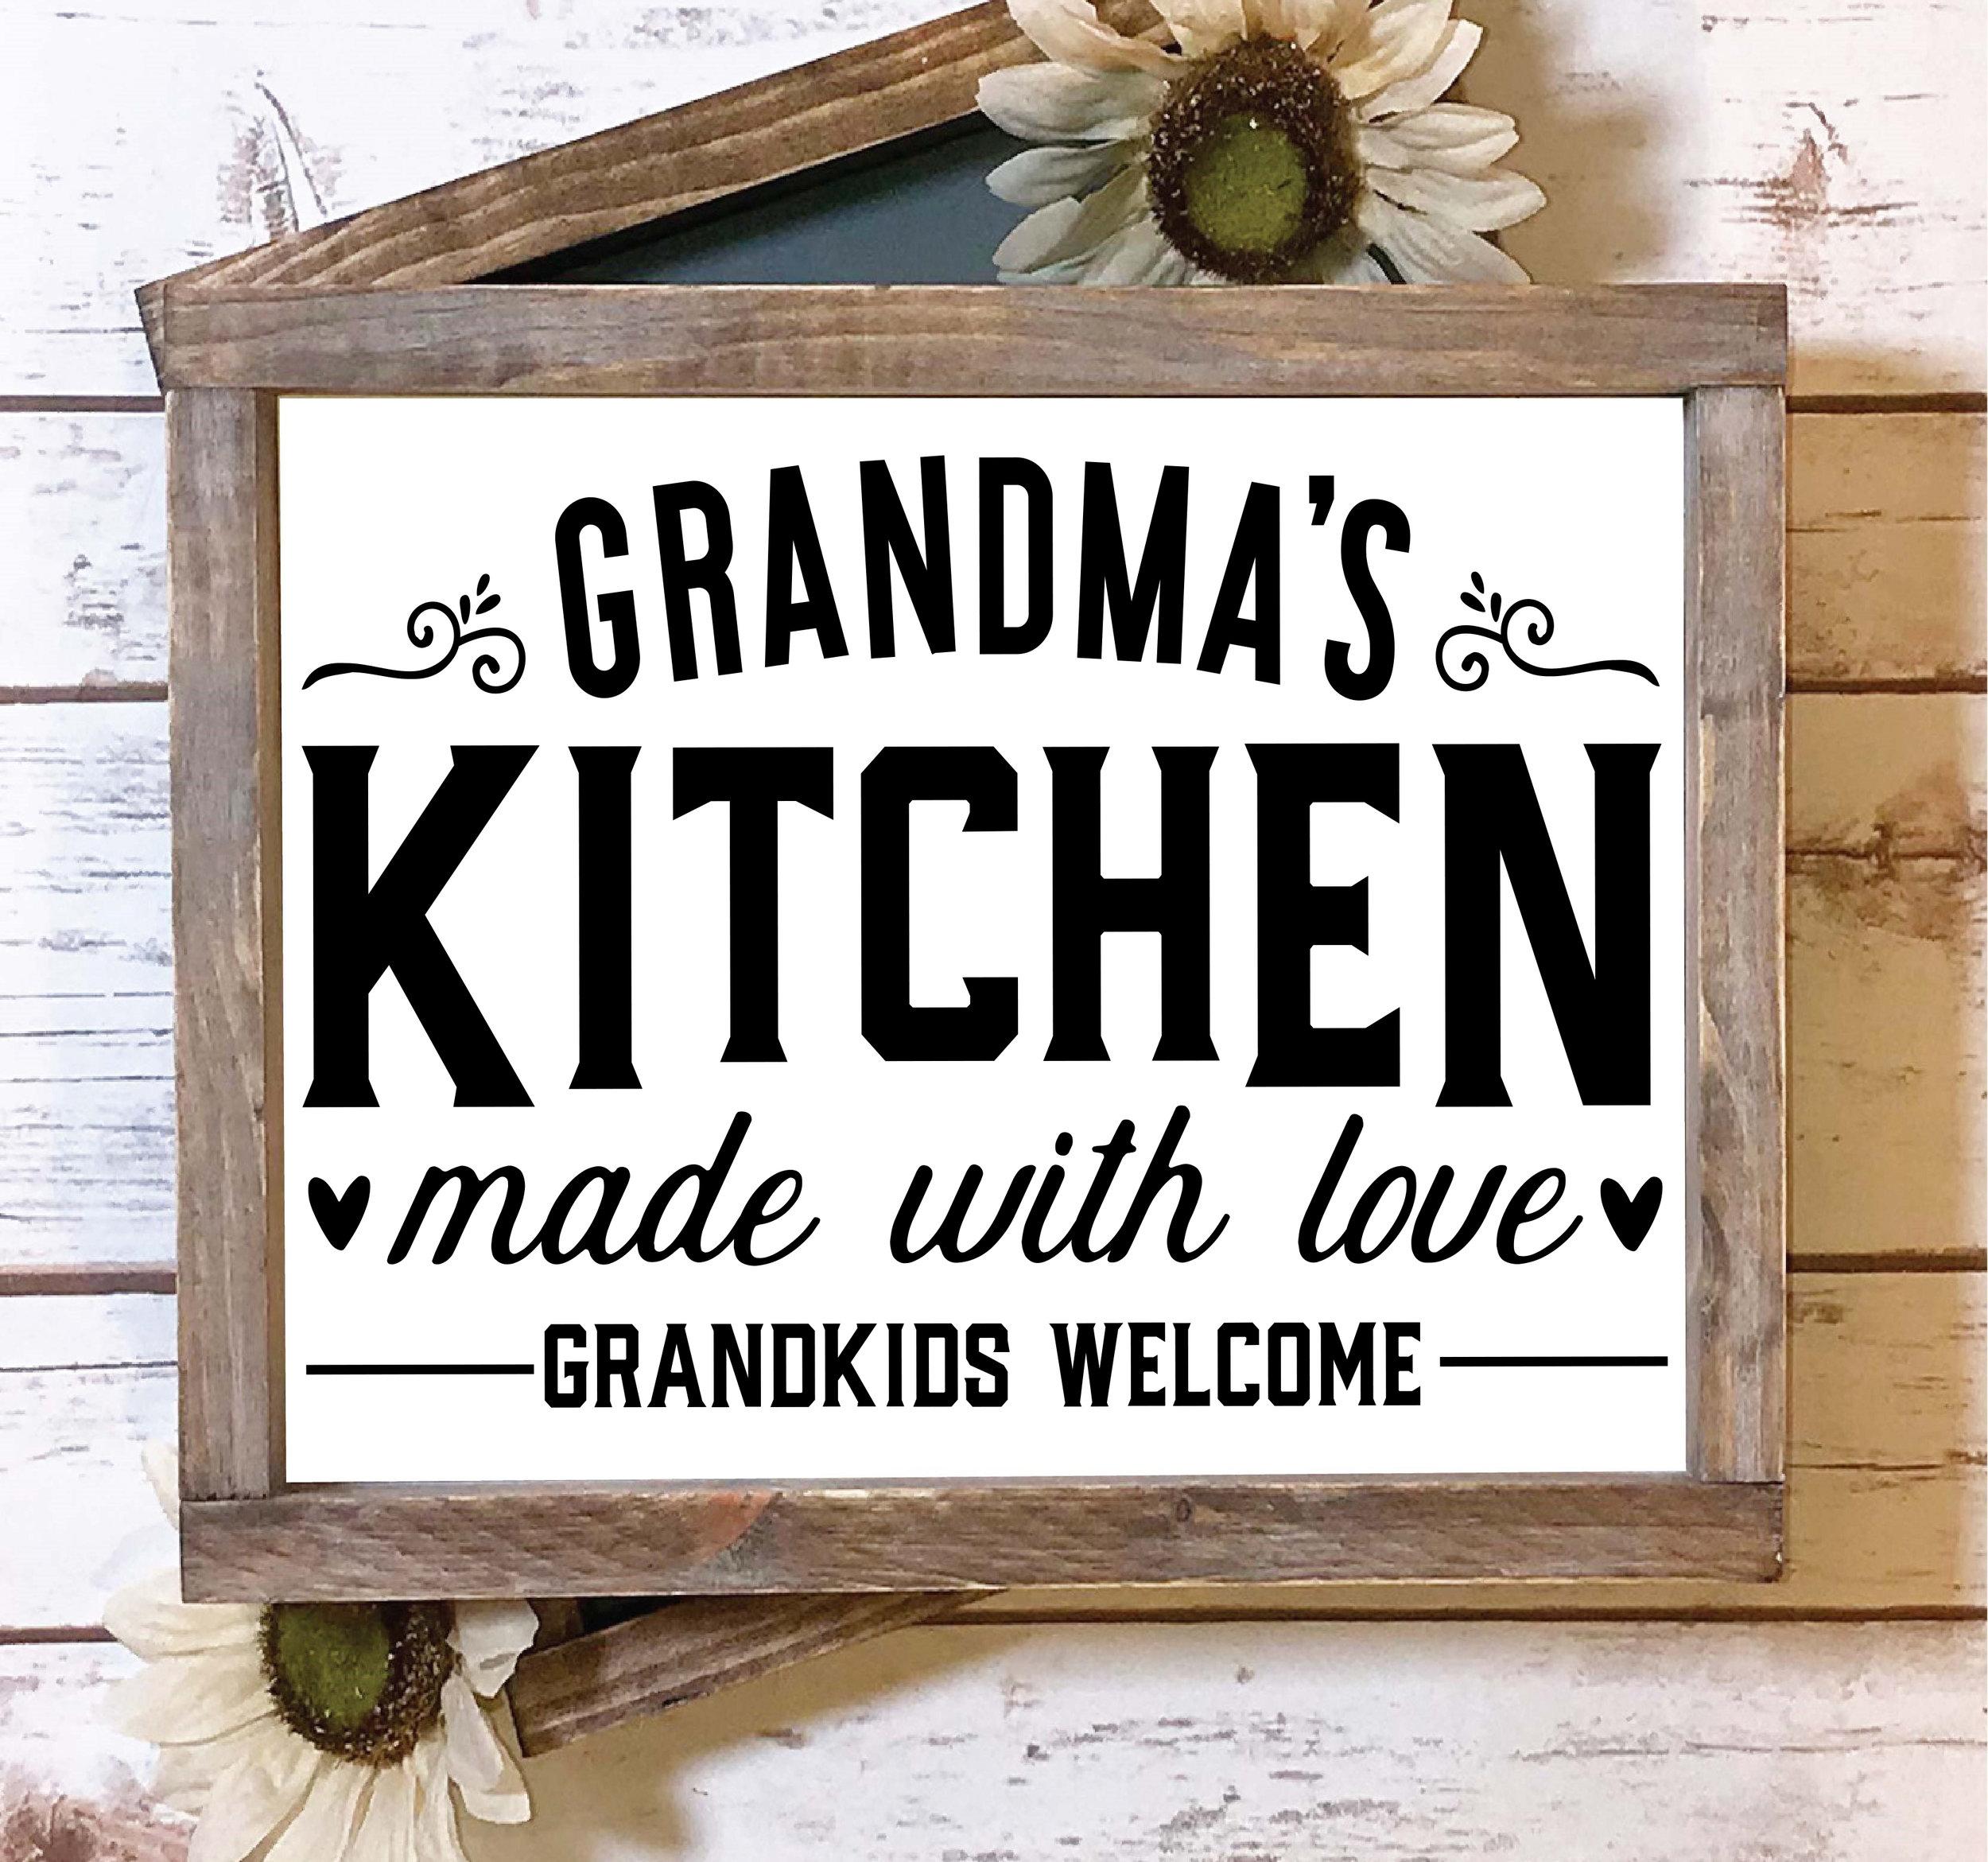 Grandmas Kitchen.jpg